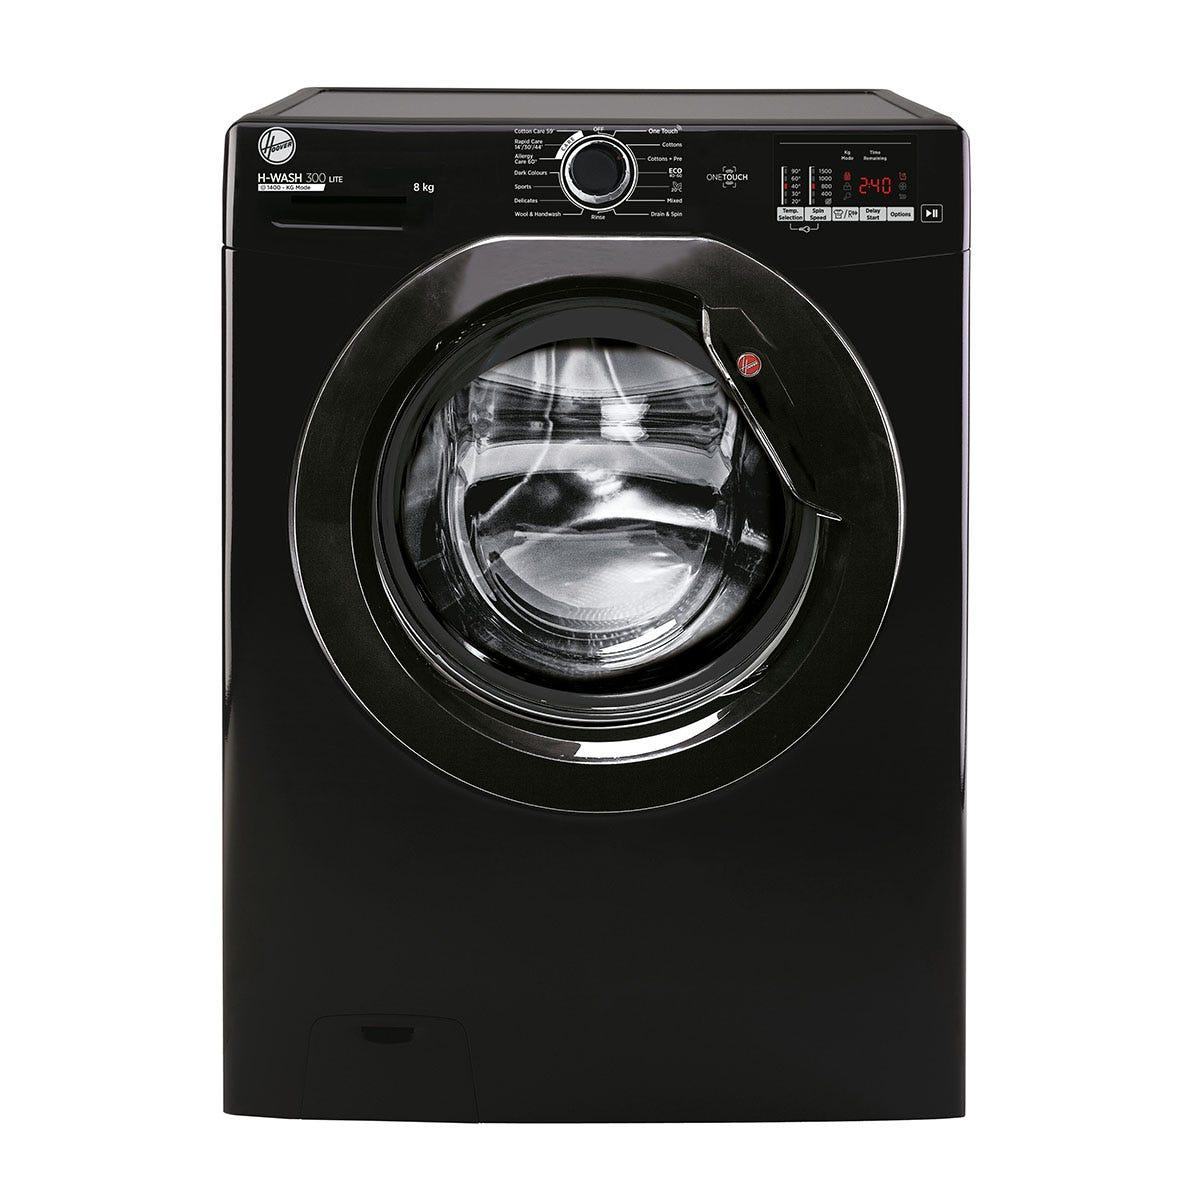 Hoover H3W 582DBBE H-Wash 300 8kg 1500rpm Digital Washing Machine - Black